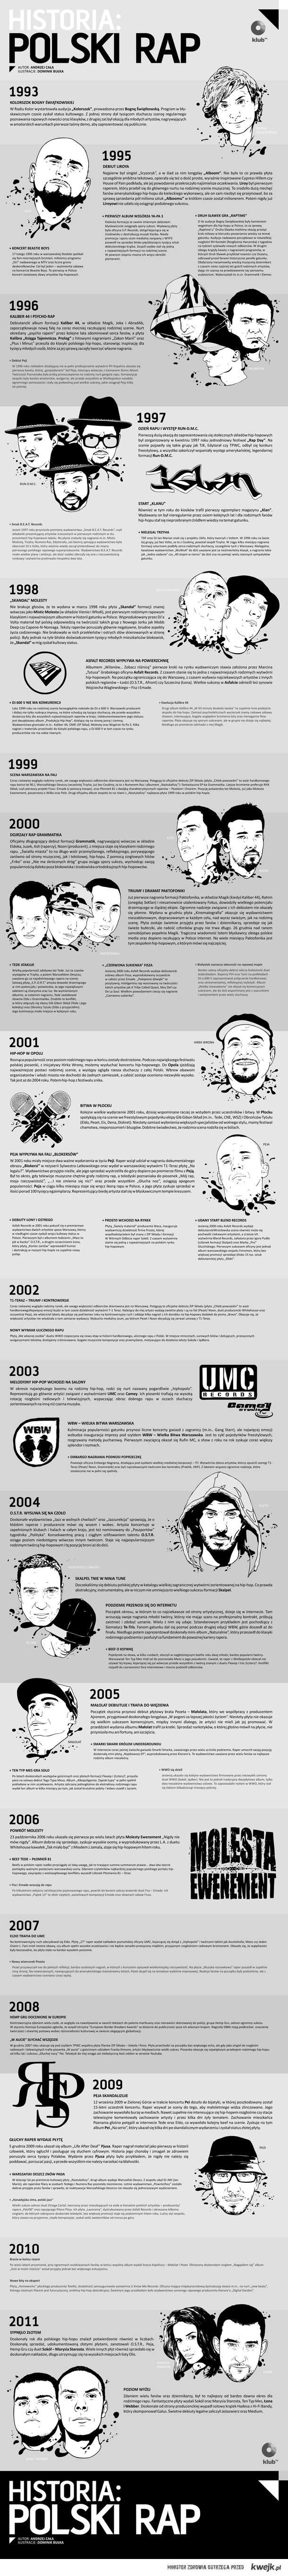 historia polskiego rapu